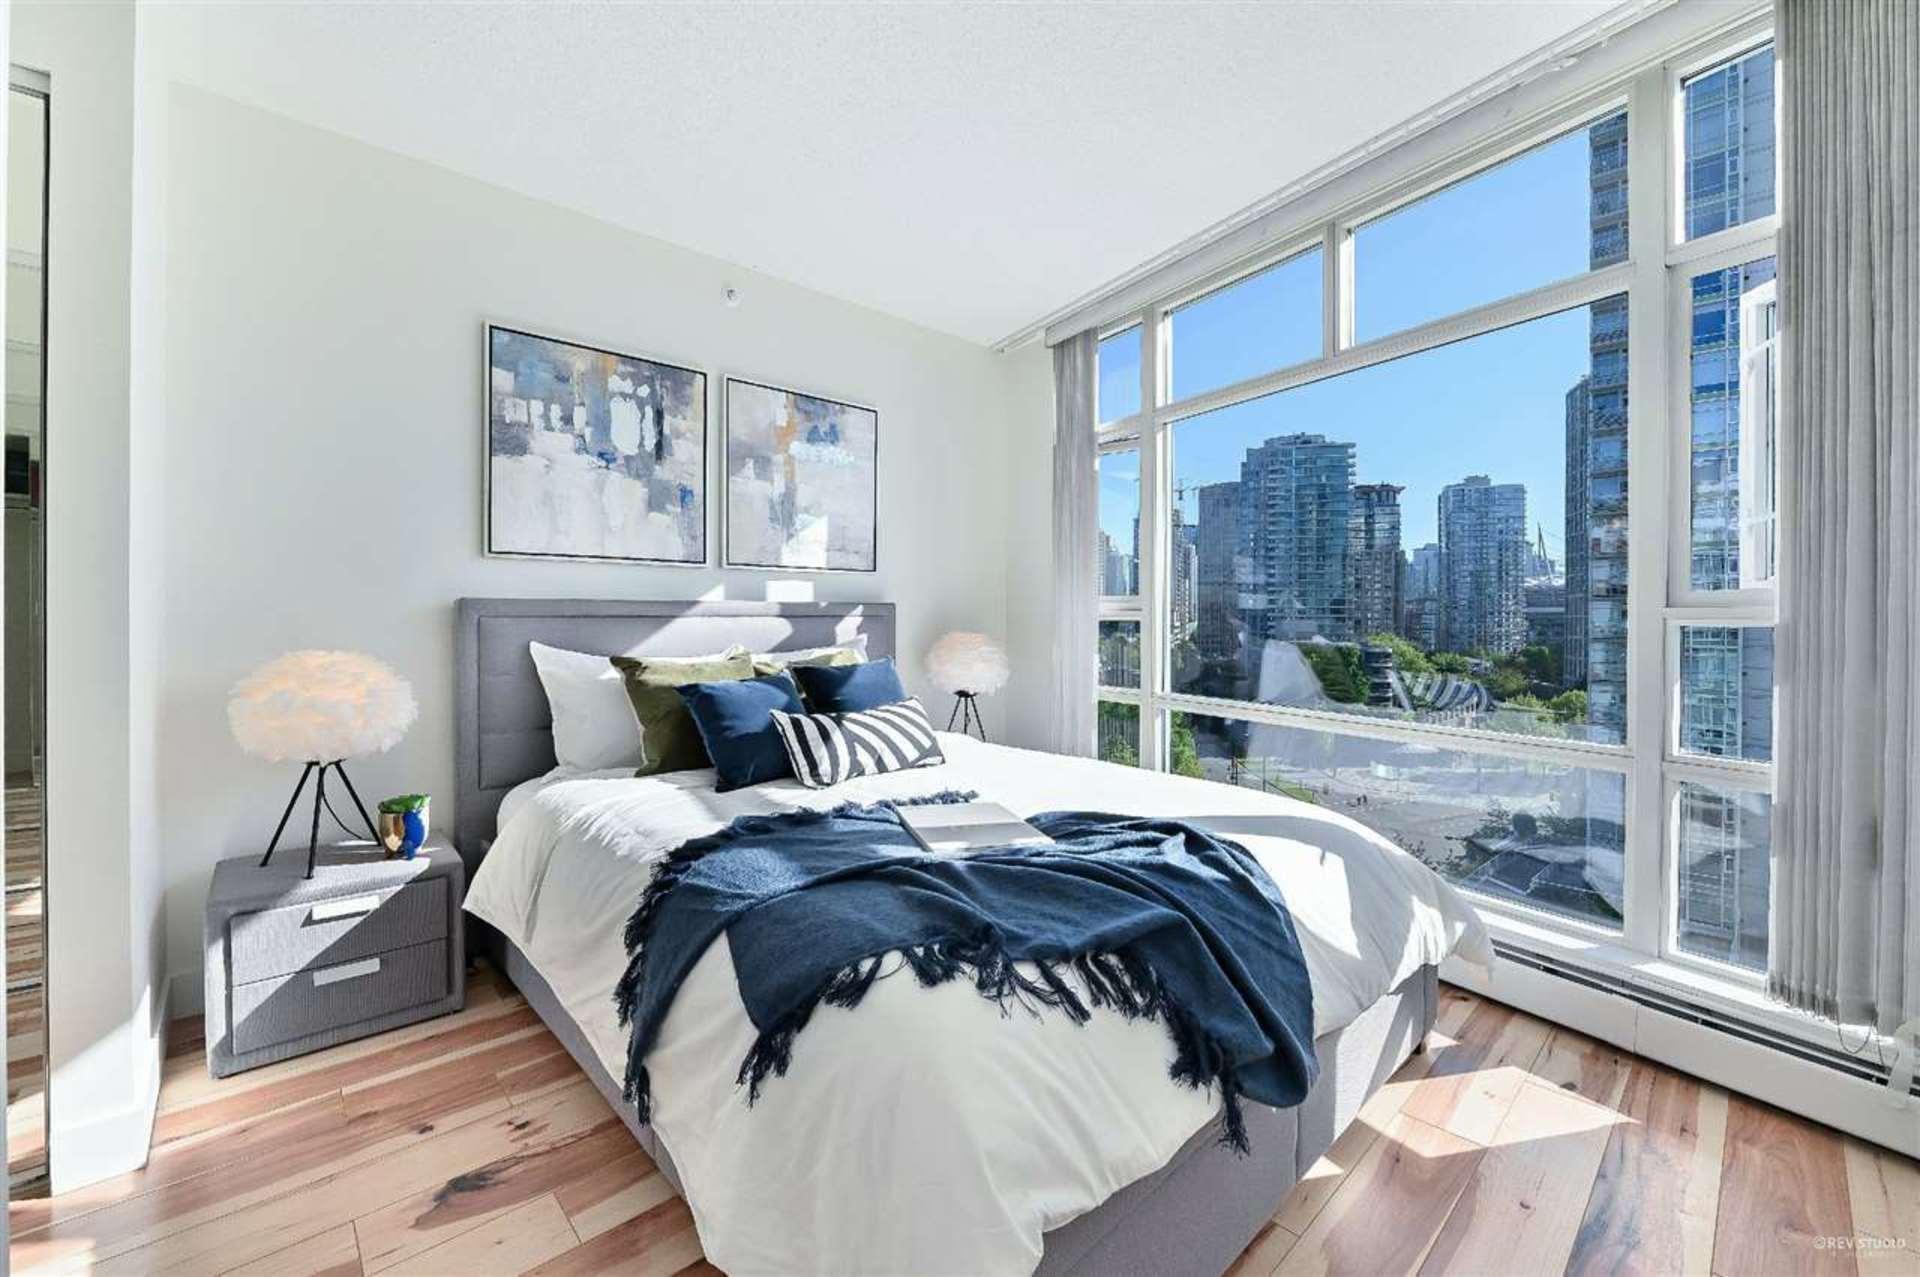 189-davie-street-yaletown-vancouver-west-15 at 1105 - 189 Davie Street, Yaletown, Vancouver West